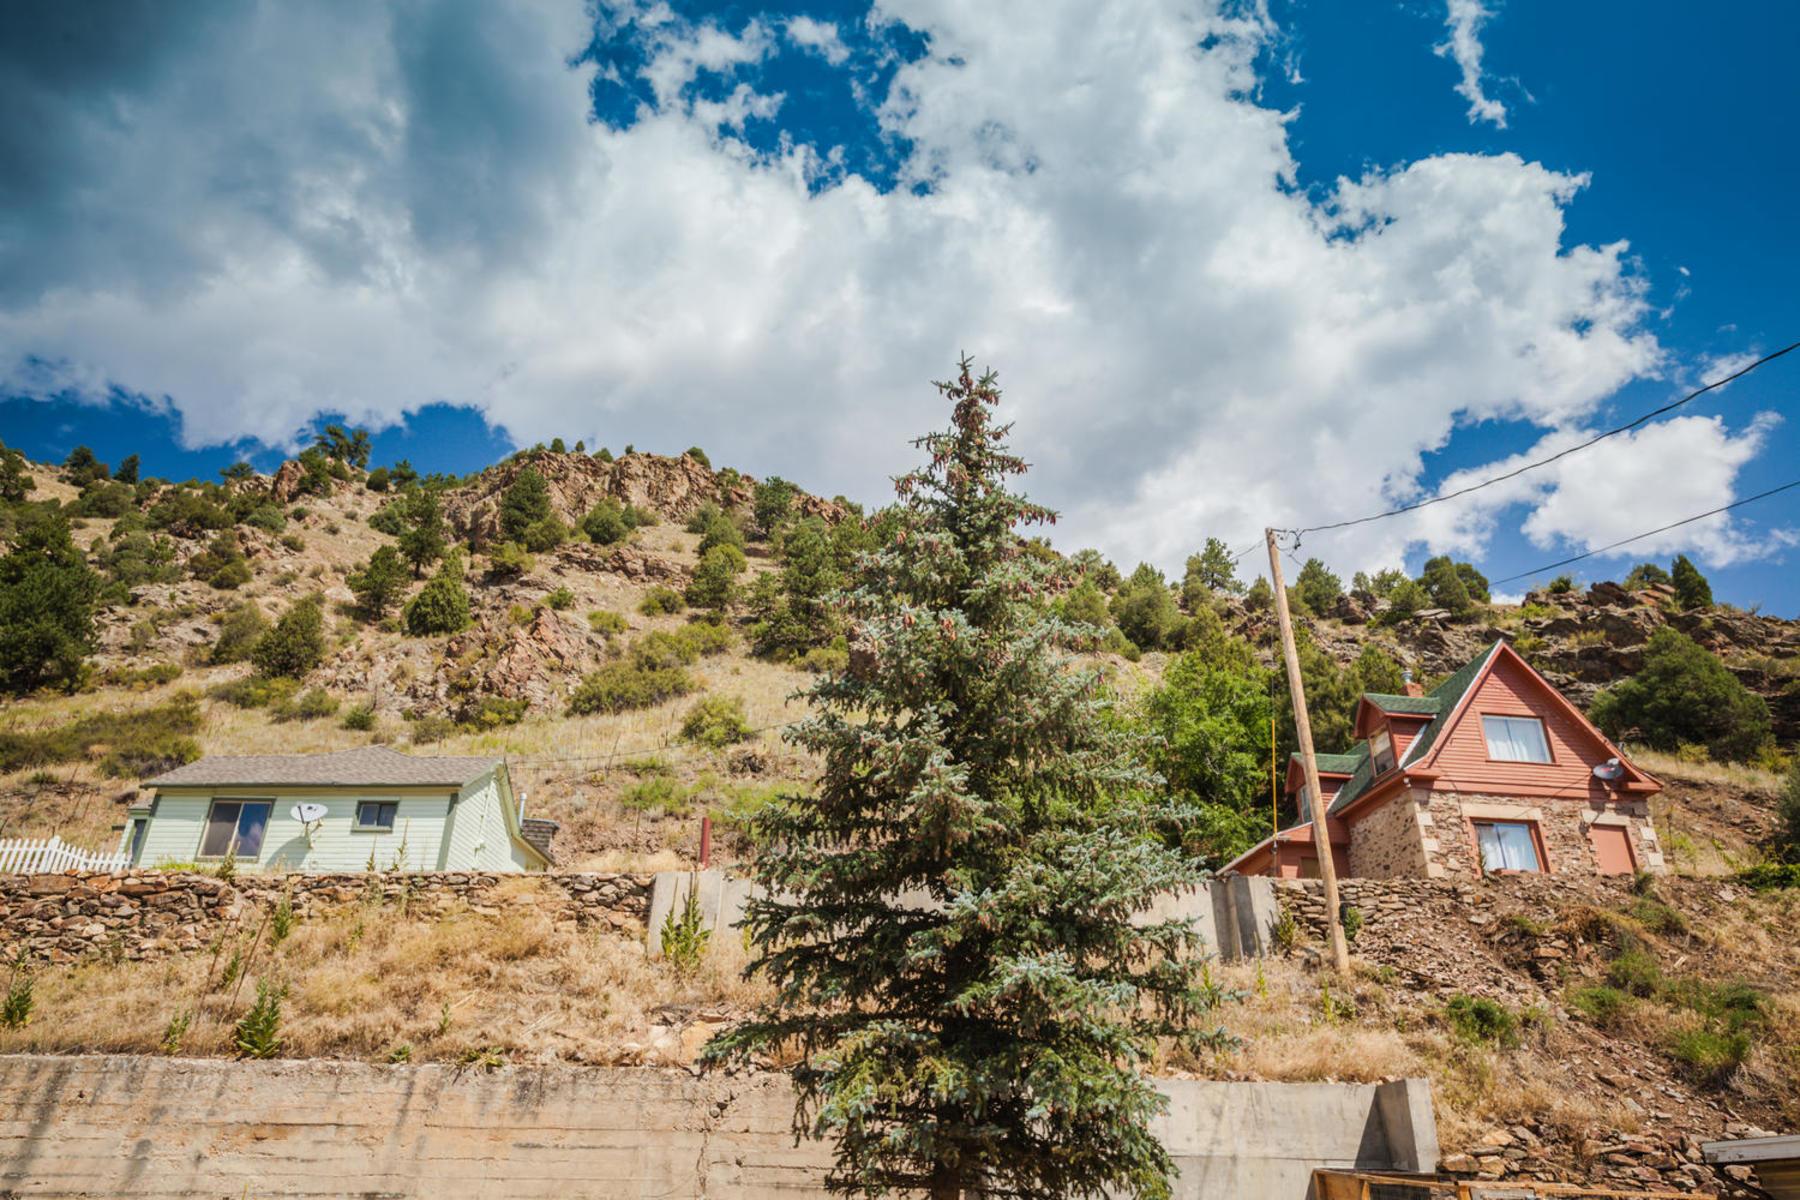 Single Family Homes için Satış at Idaho Springs, Colorado 80452 Amerika Birleşik Devletleri